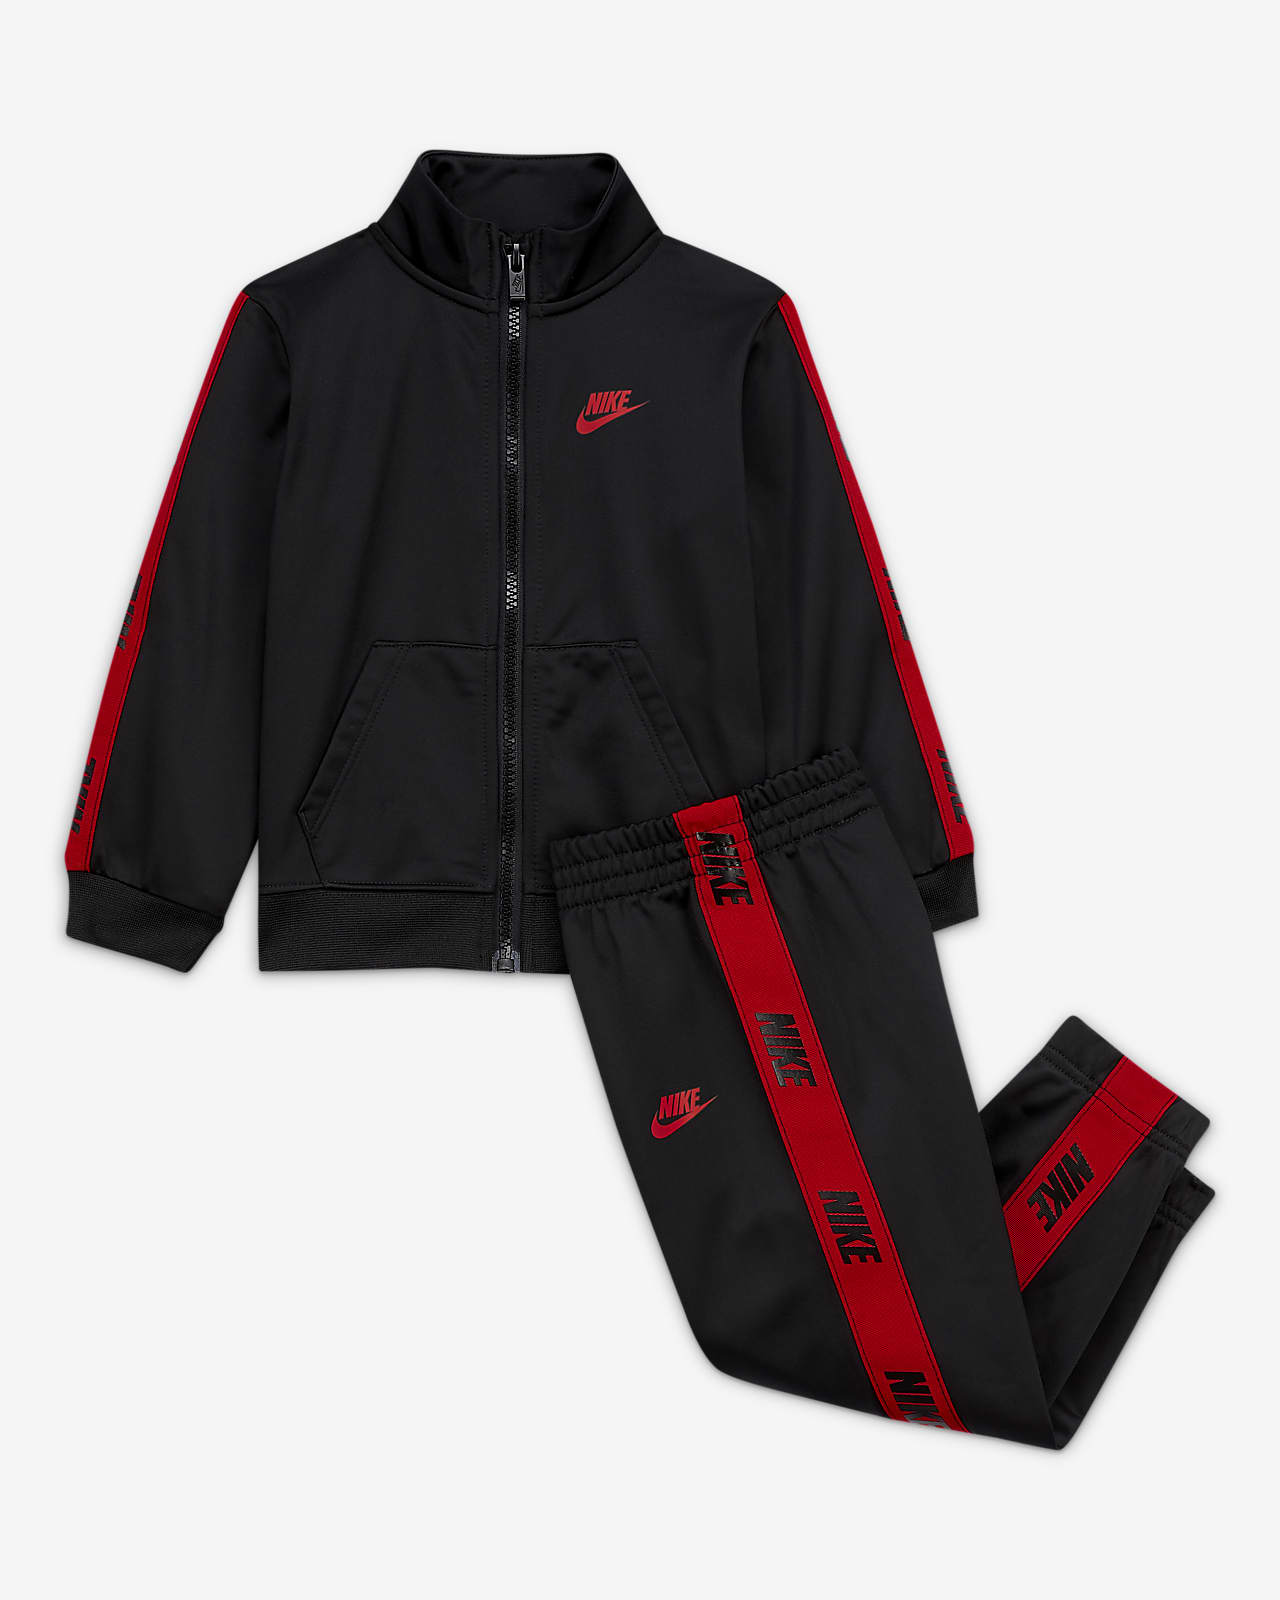 Nike Sportswear Baby (12-24M) Tracksuit